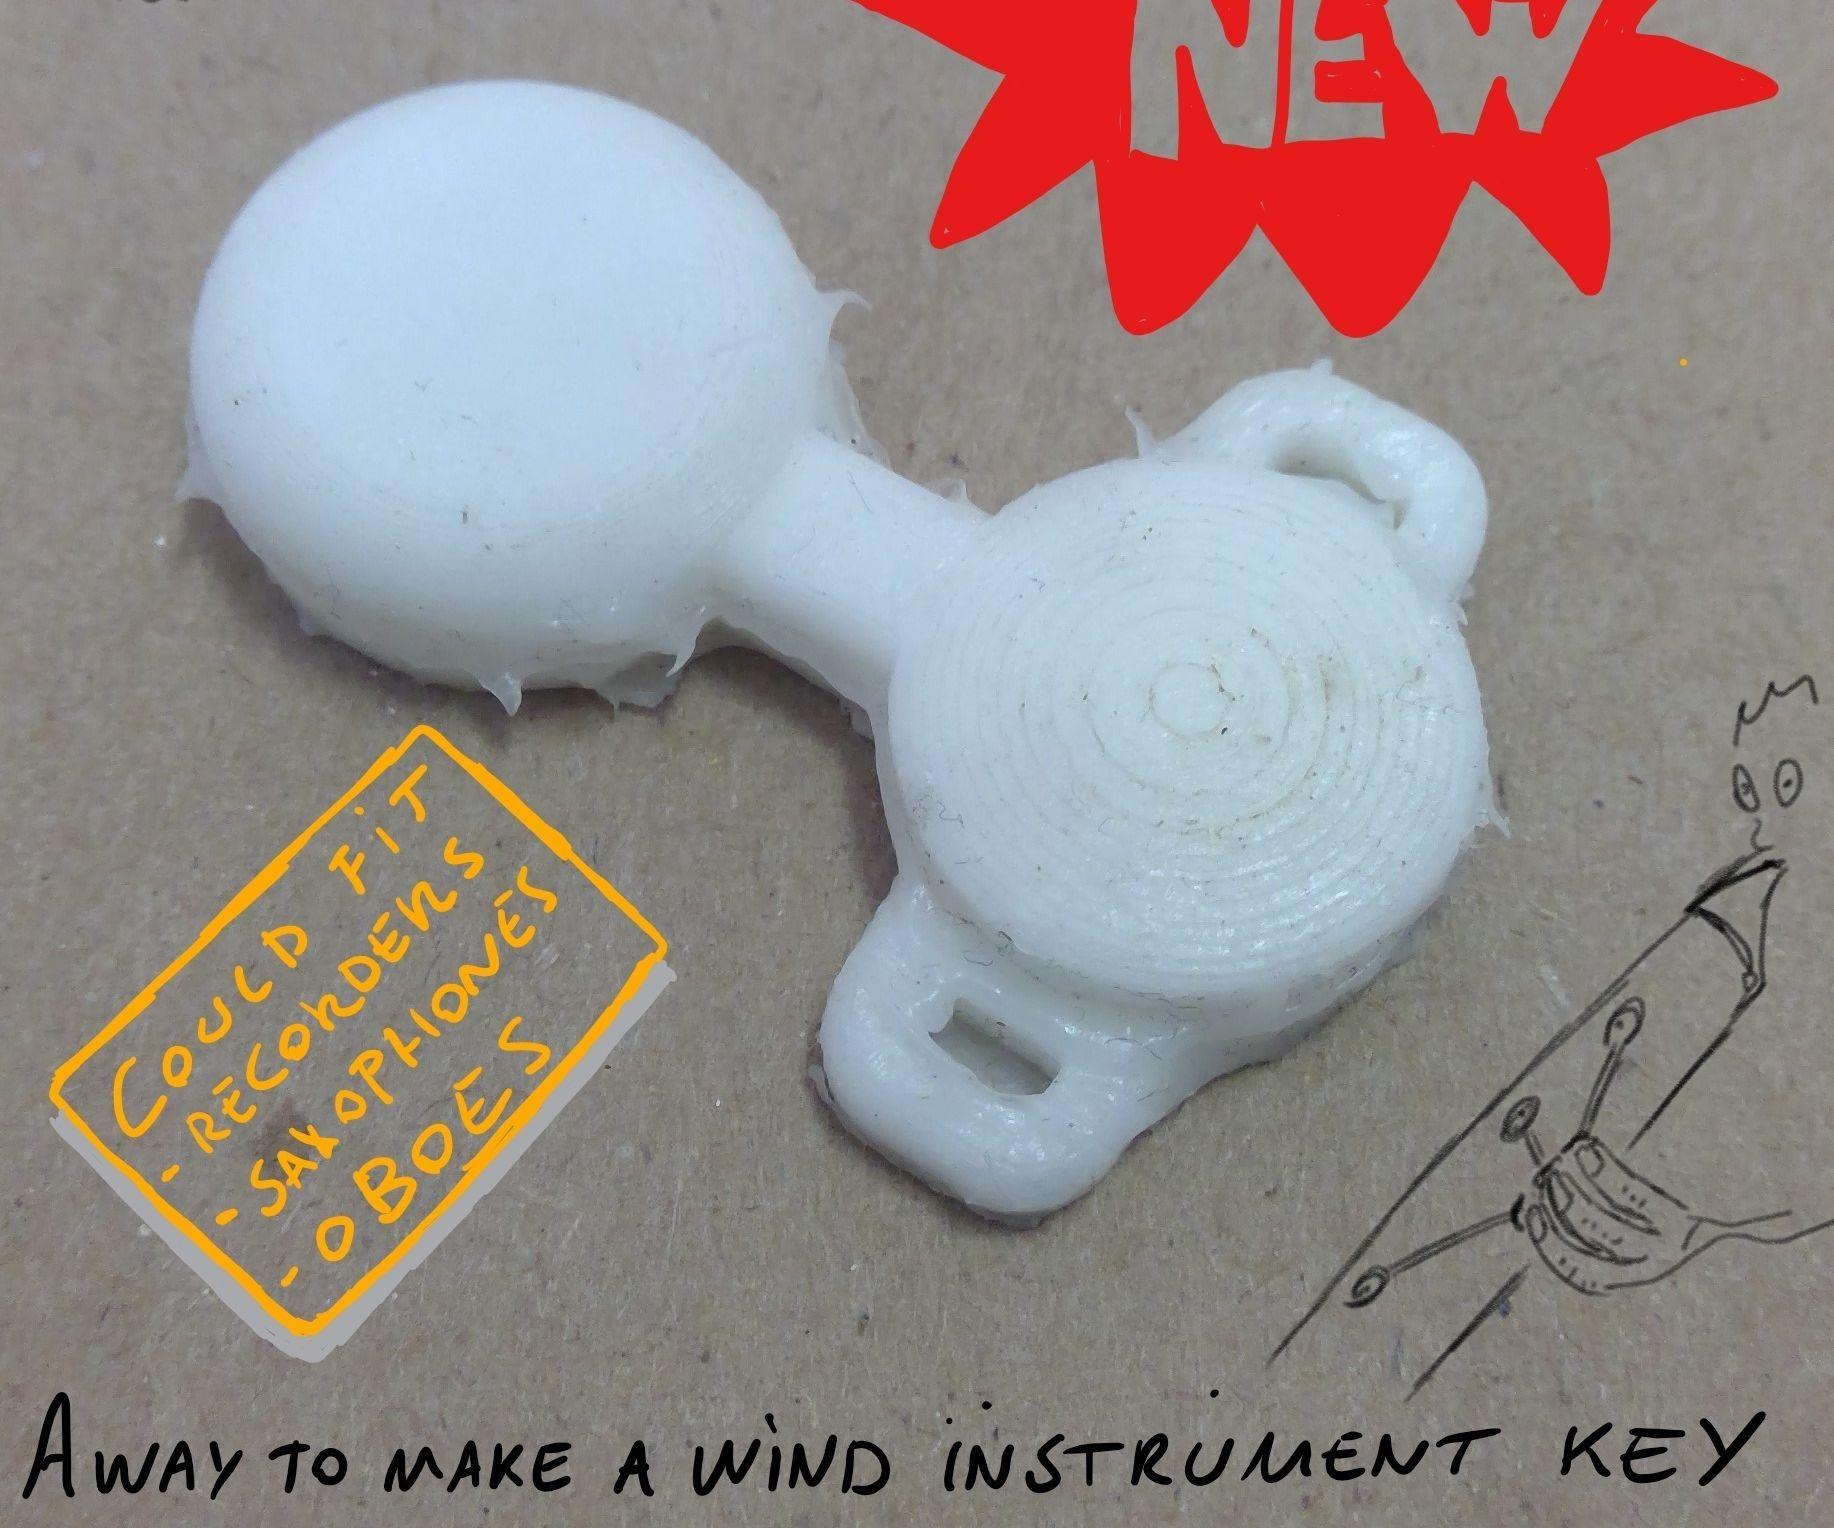 Soft Pneumatic Wind Instrument Key Concept